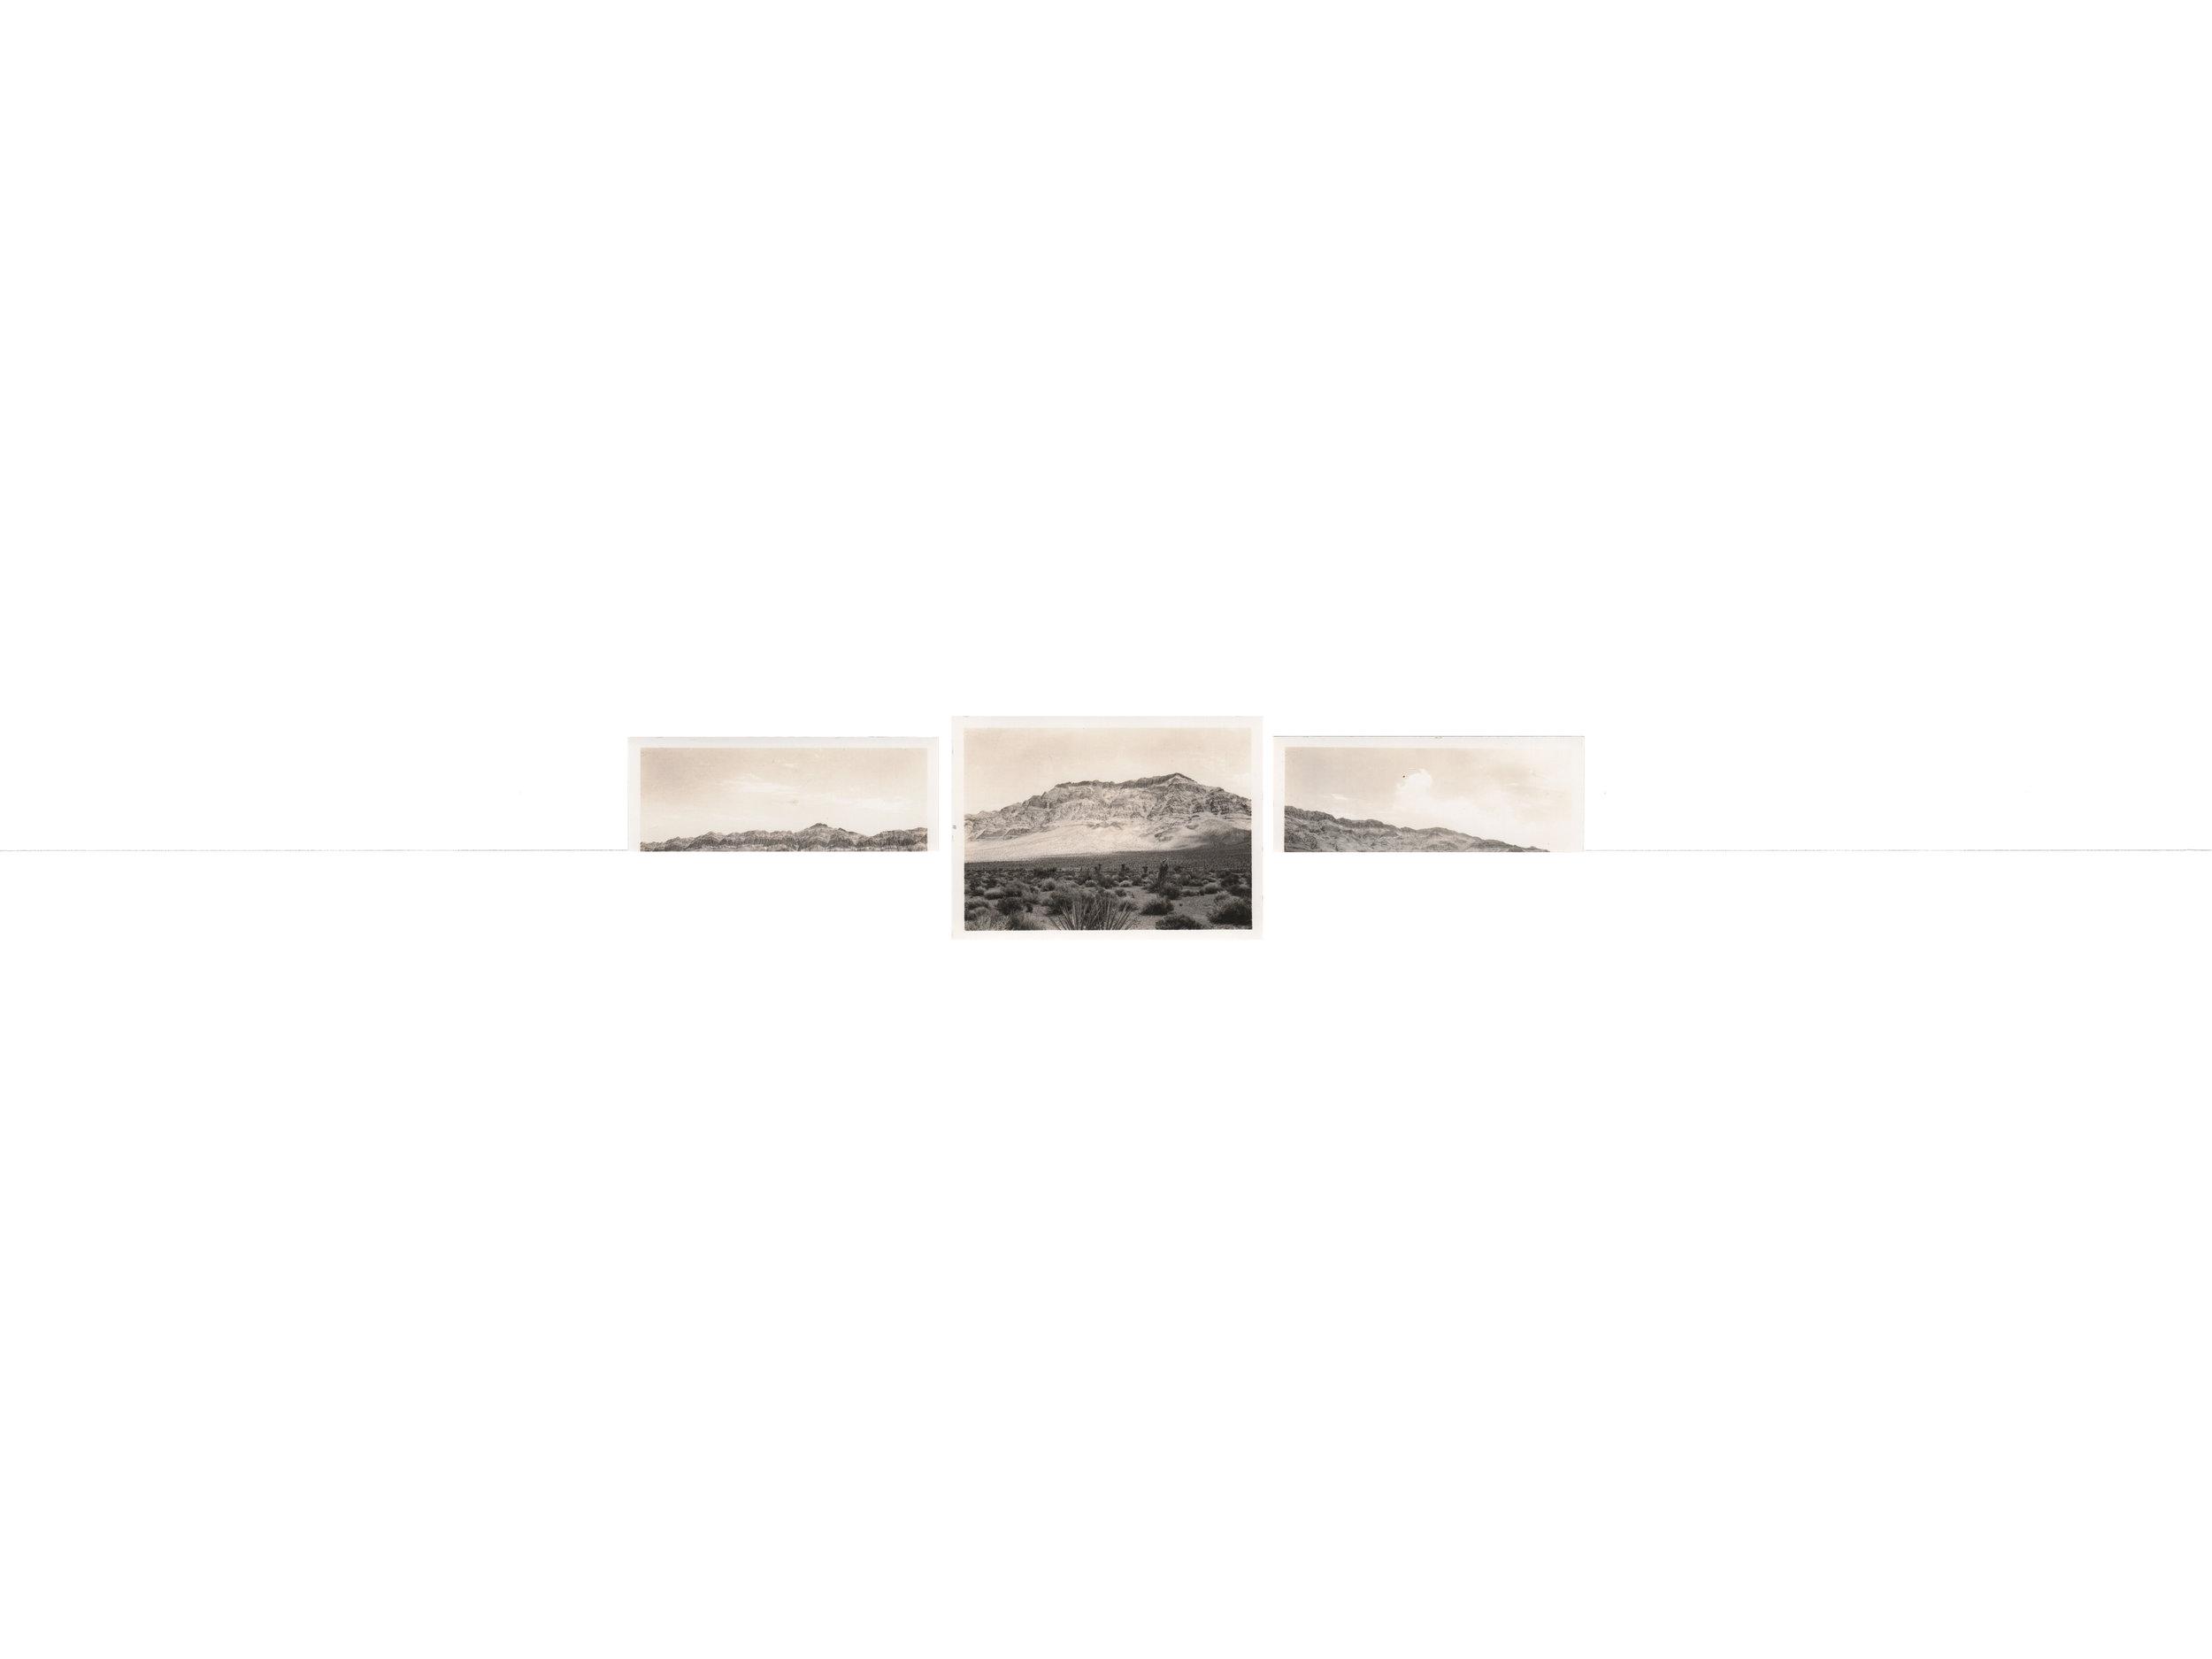 Westward Yearning No. 31  18 x 24 inches | 2019